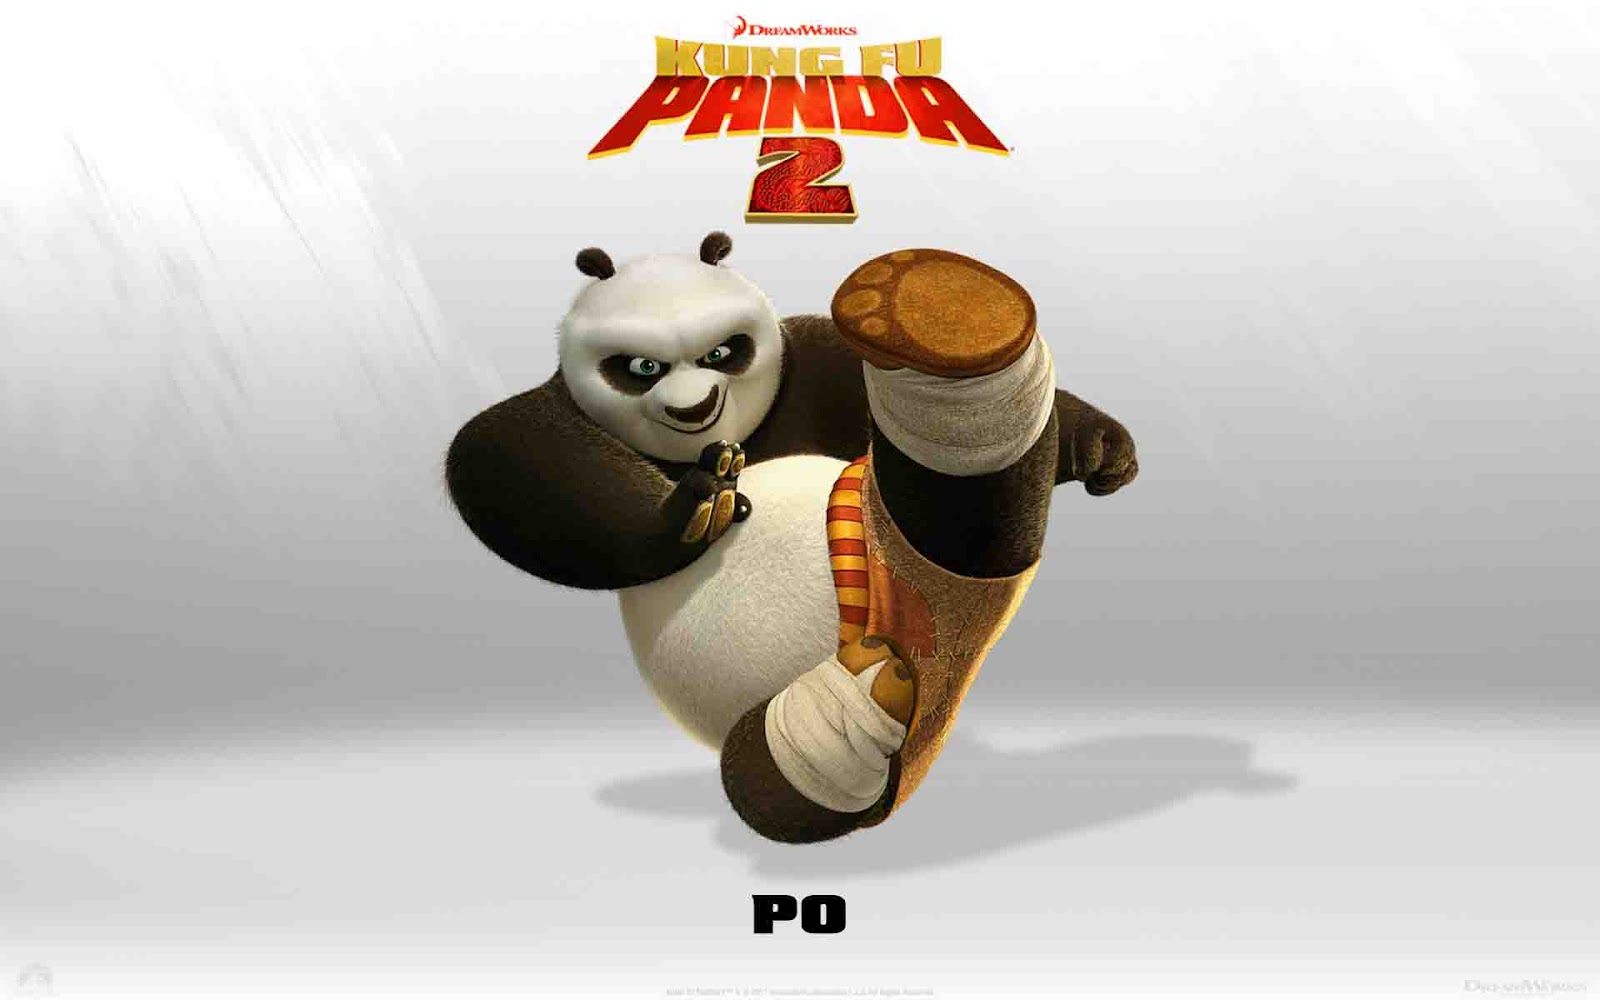 http://2.bp.blogspot.com/-MH3SaW9Kqlw/T02ptFNxdjI/AAAAAAAAAiE/E1lD8LCAj6A/s1600/kung-fu-panda-2-po.jpg